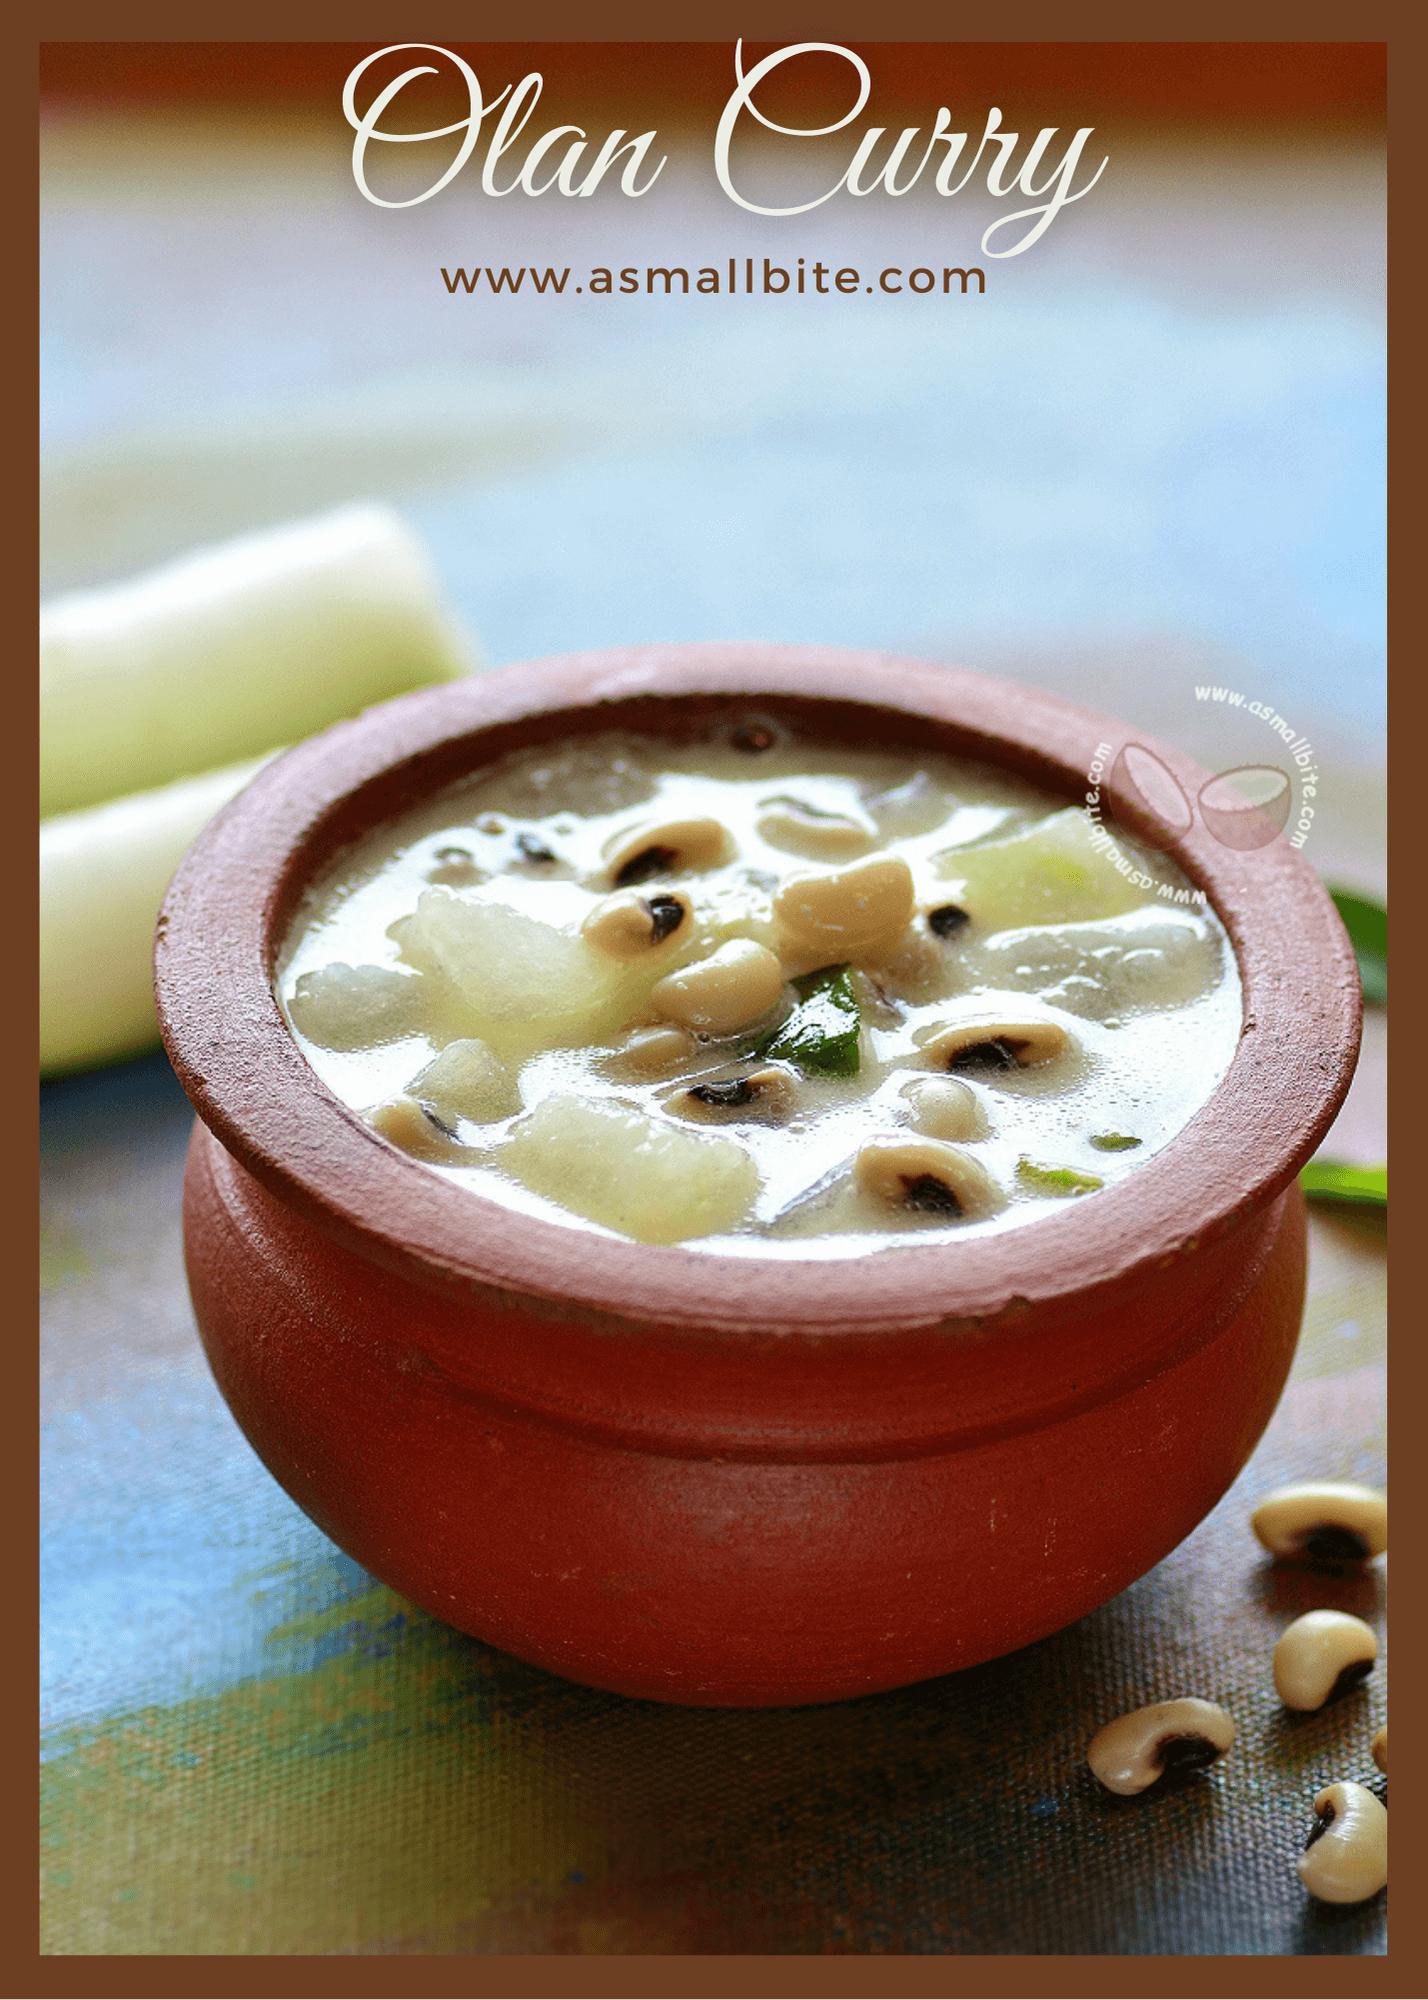 Olan Curry Recipe